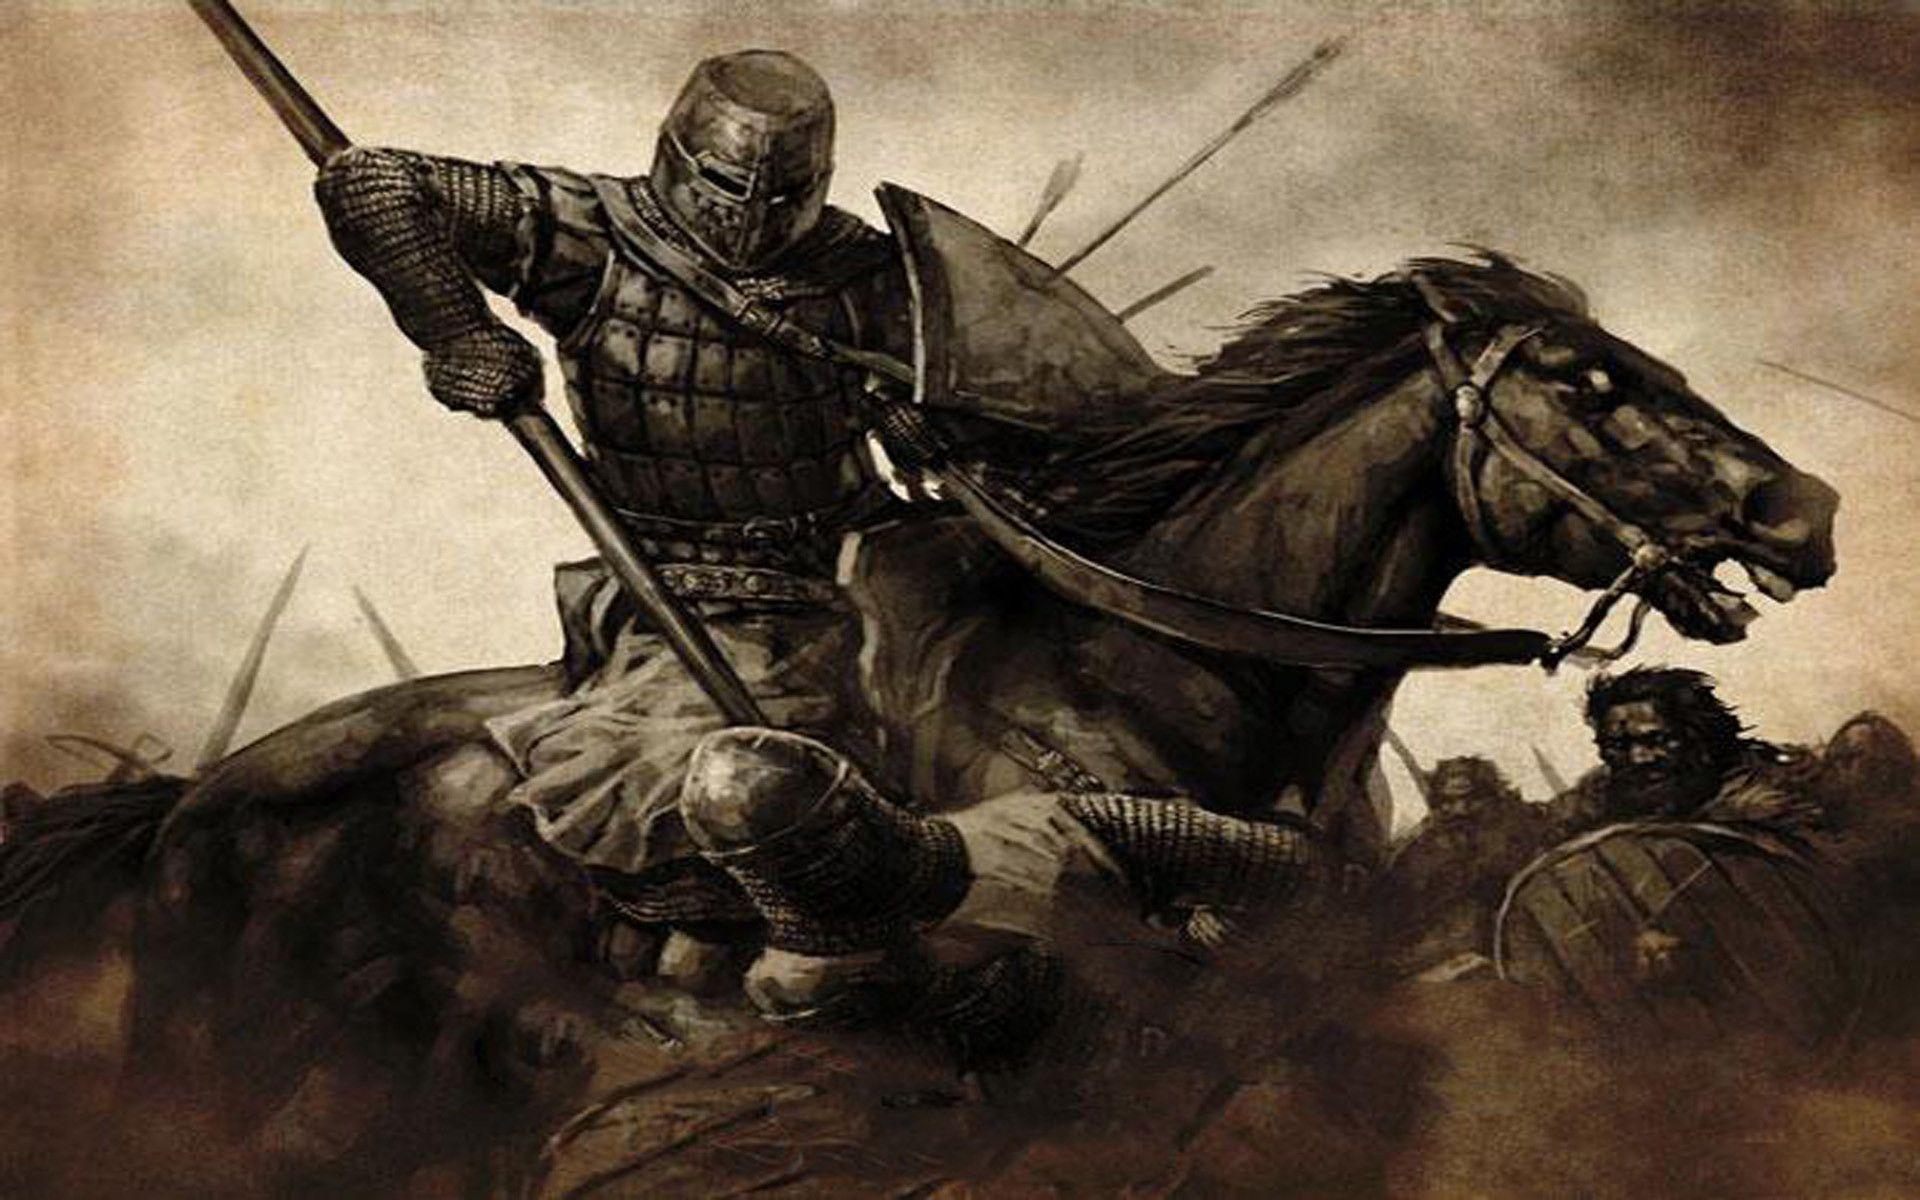 64 Medieval Wallpapers On Wallpaperplay Medieval Knight Crusader Wallpaper Medieval